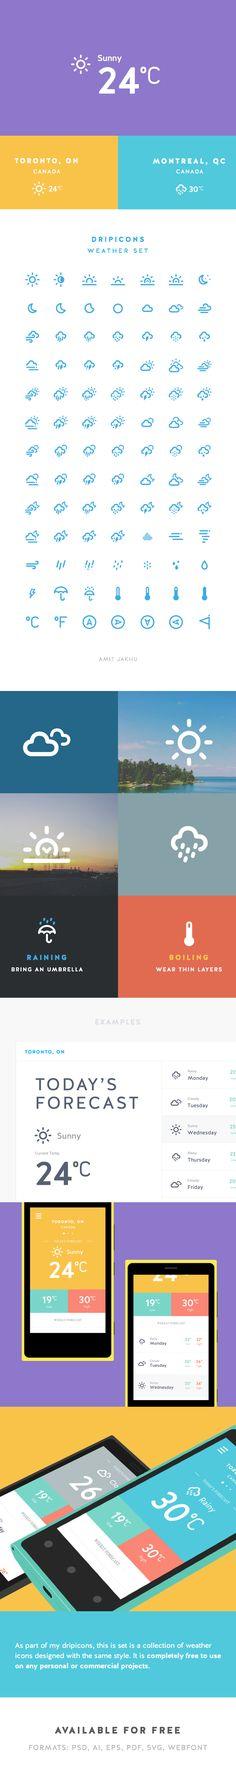 Dripicons - Weather Set (Free Iconset) by Amit Jakhu, via Behance